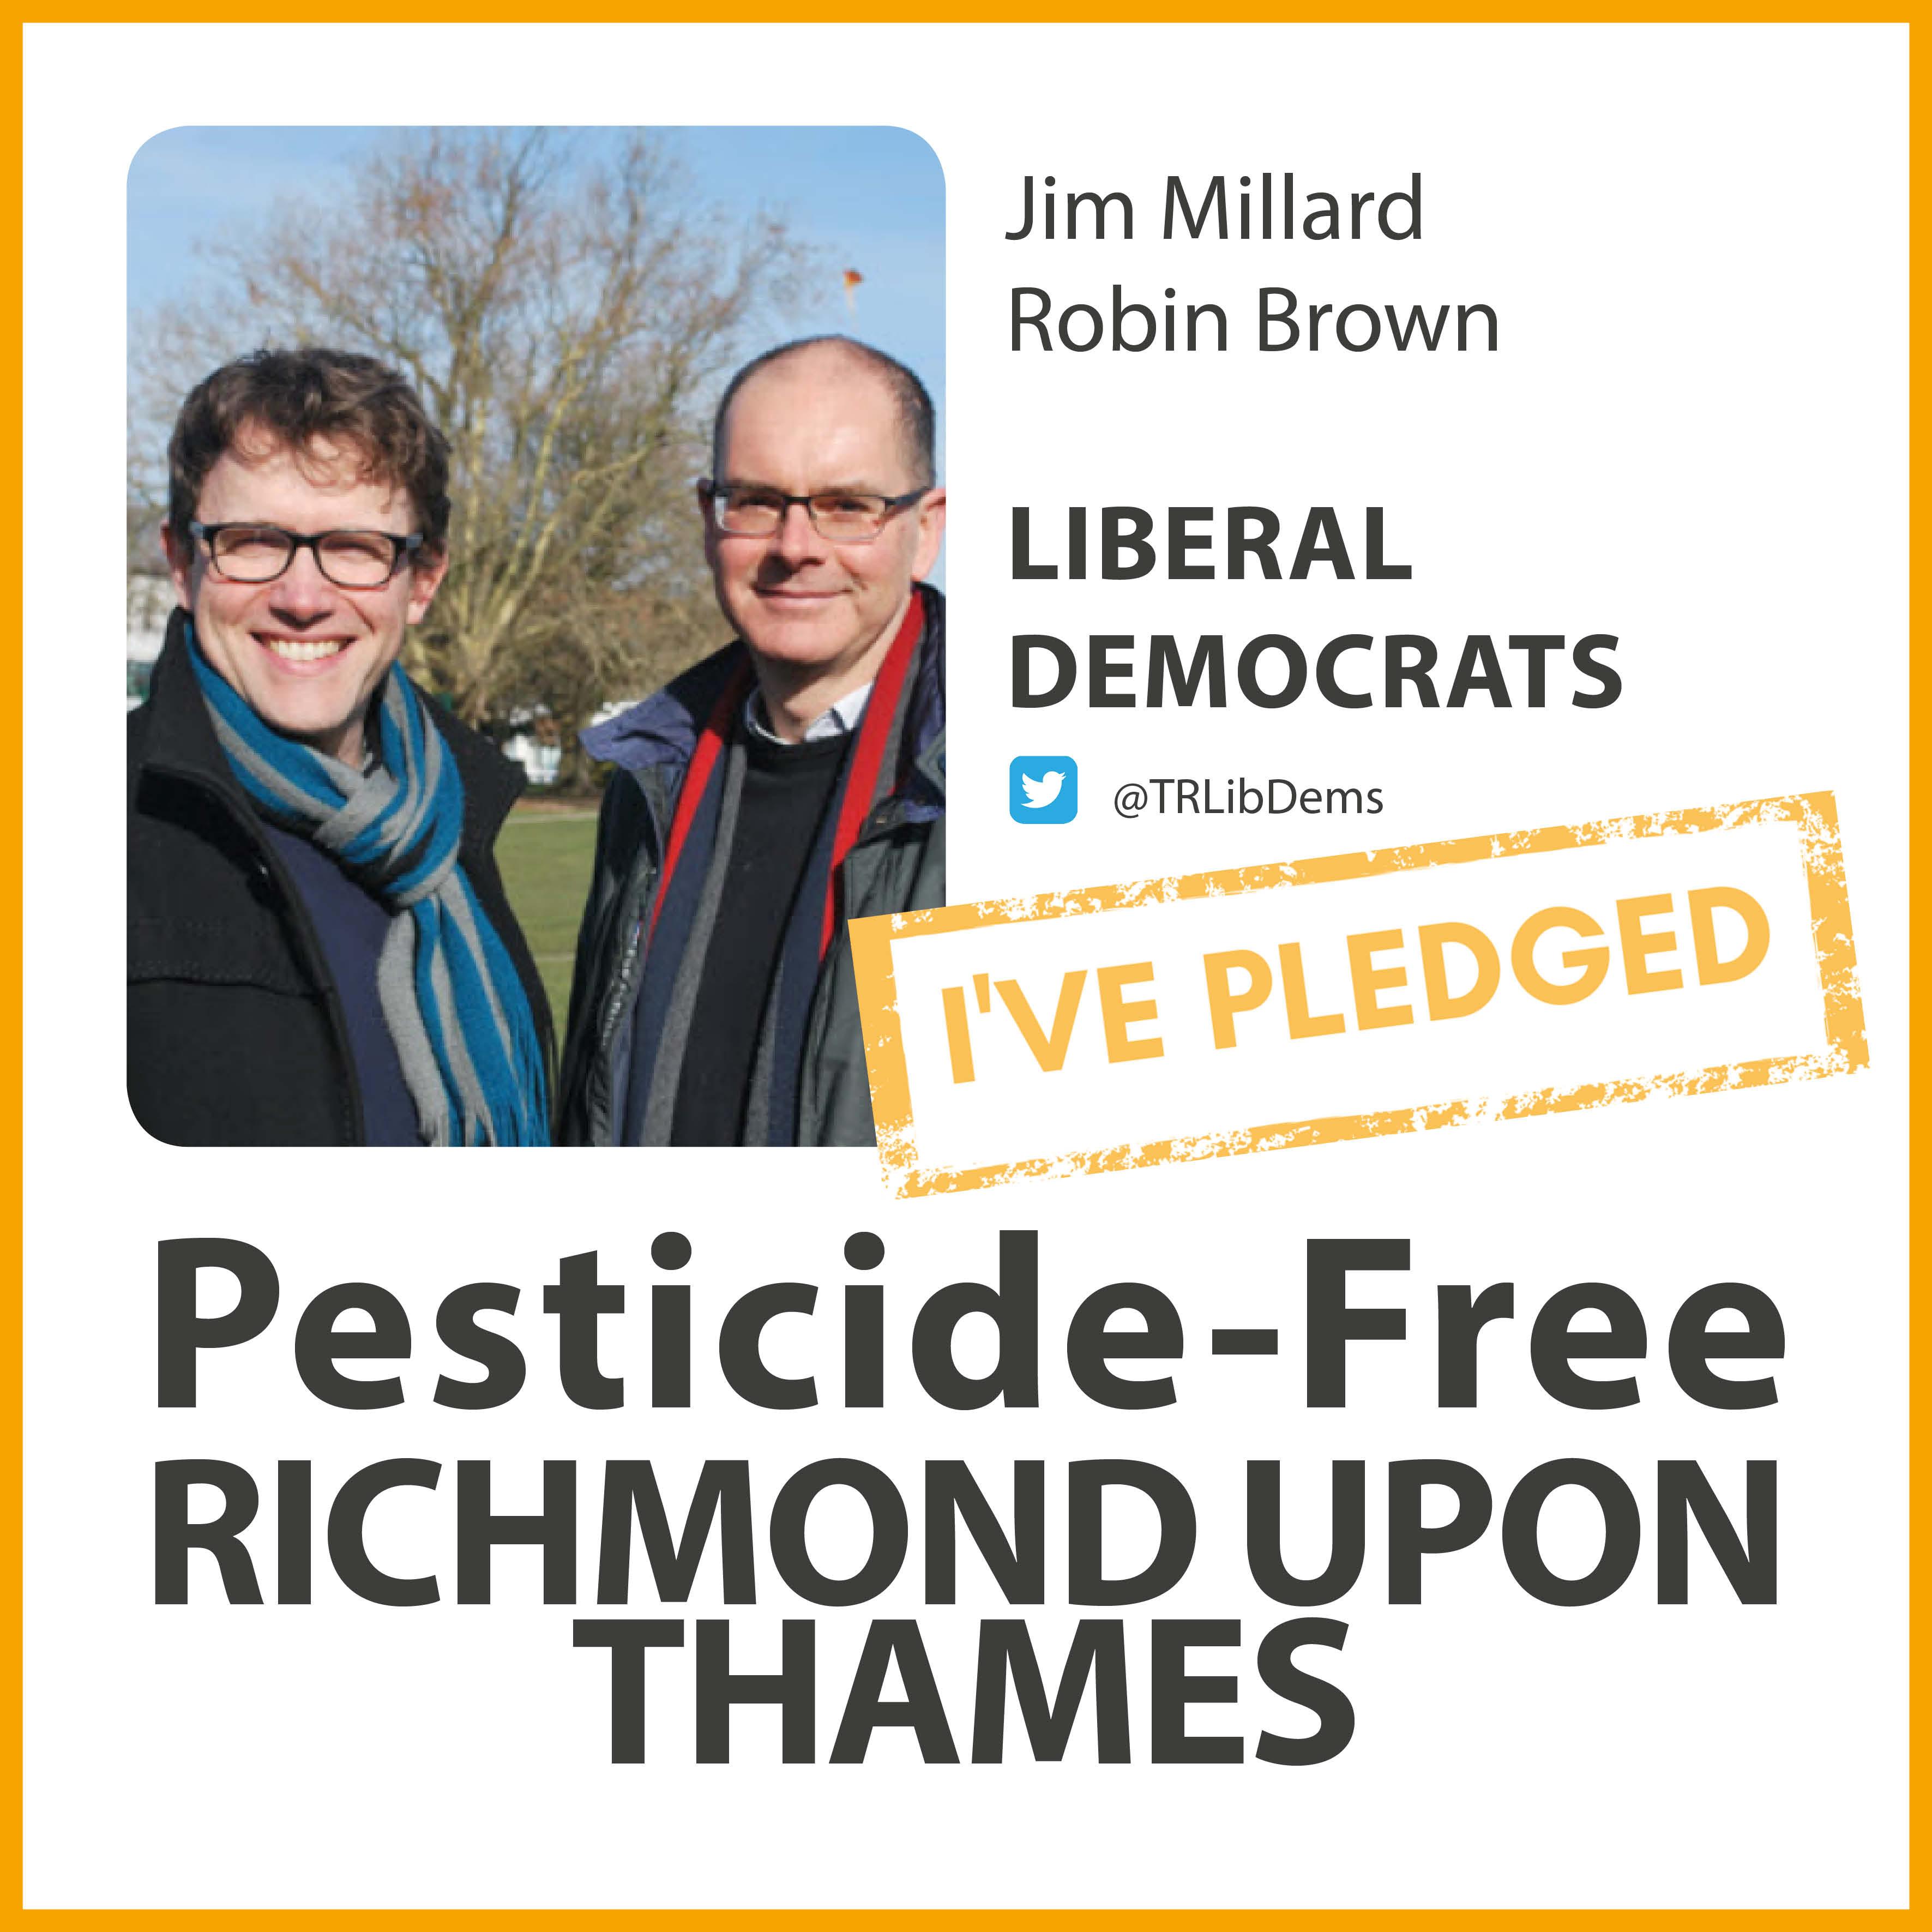 Hampton Wick Lib Dems have taken the pesticide-free pledge